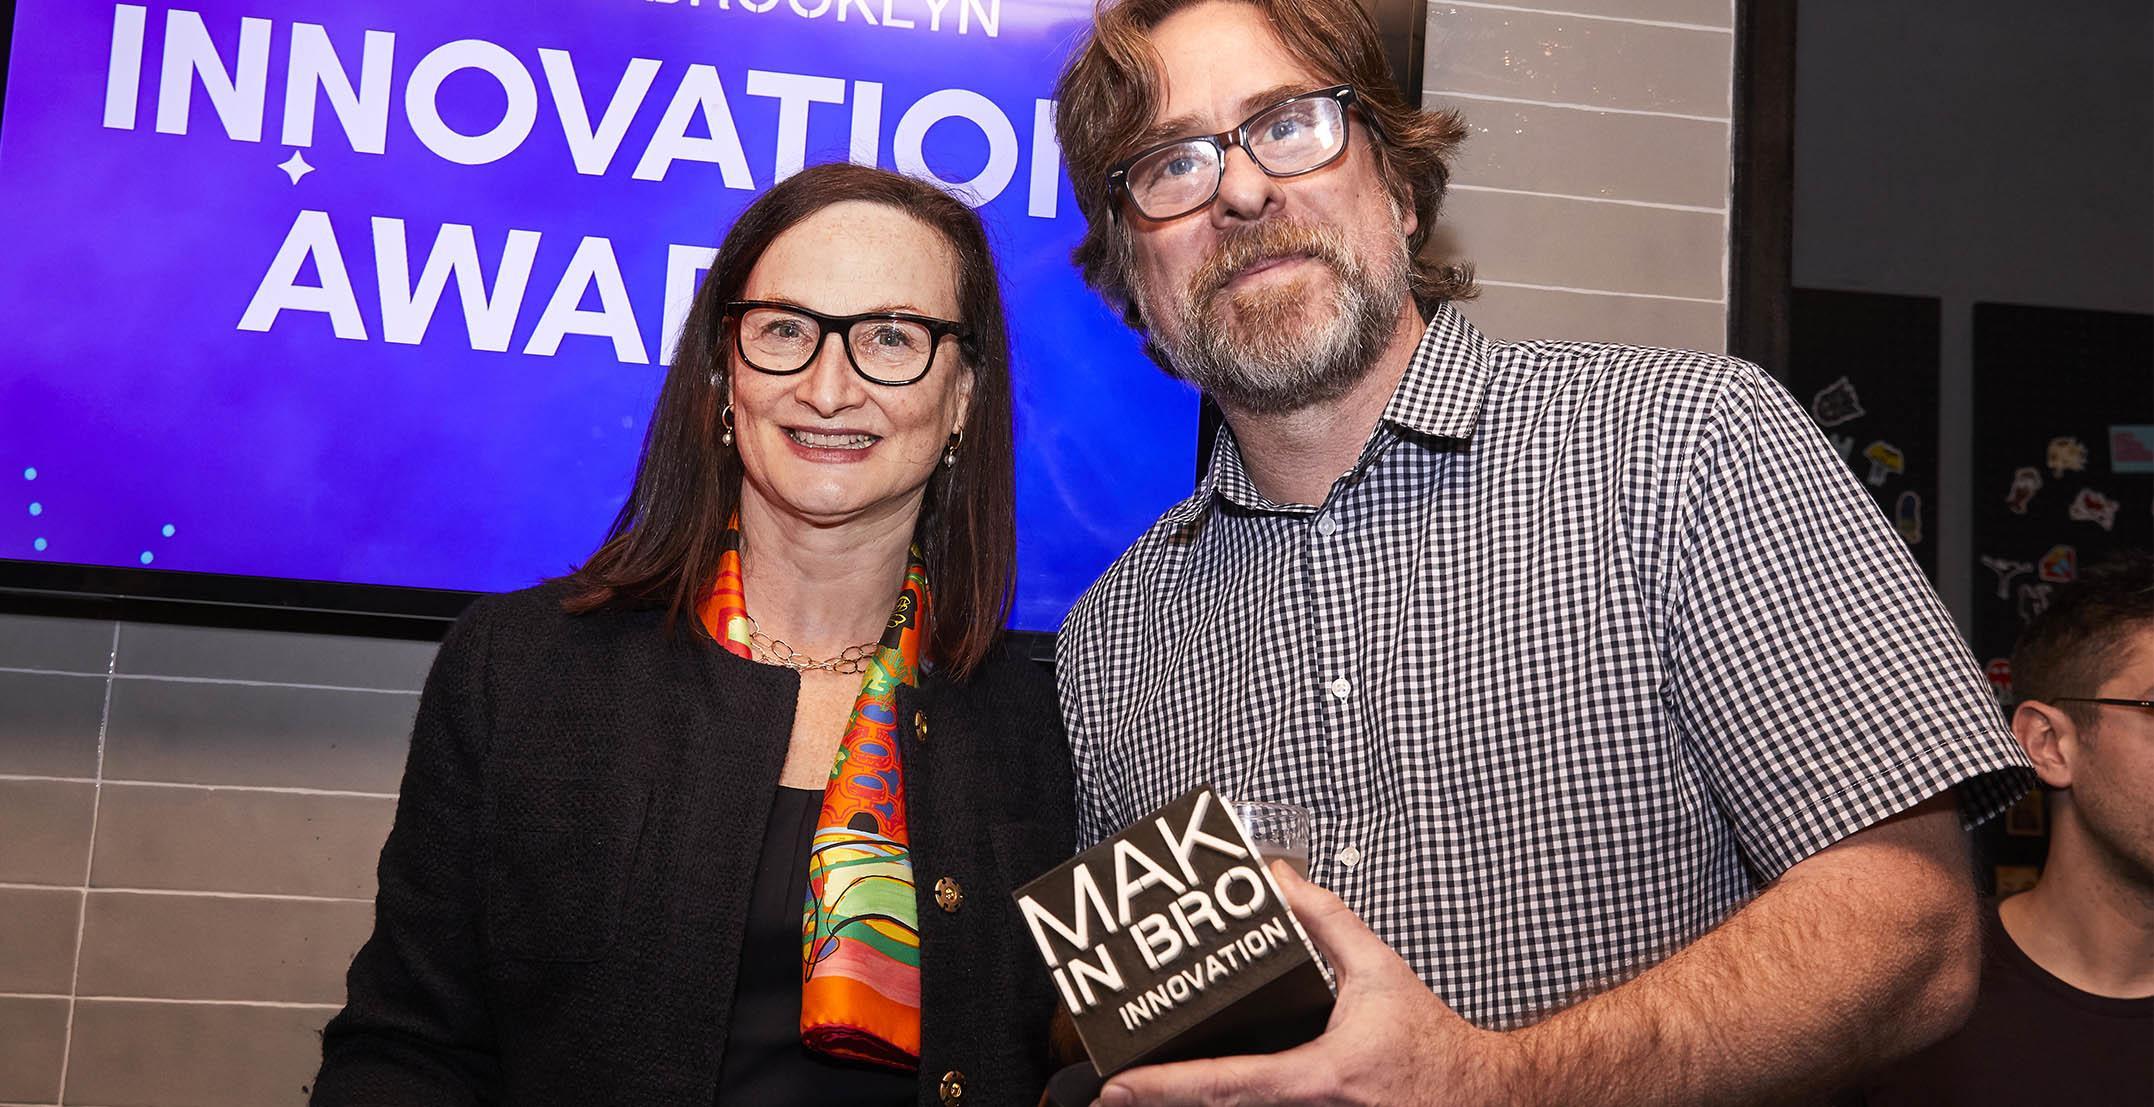 miib-innovation-awards-benefit-kitchen.jpg#asset:16382